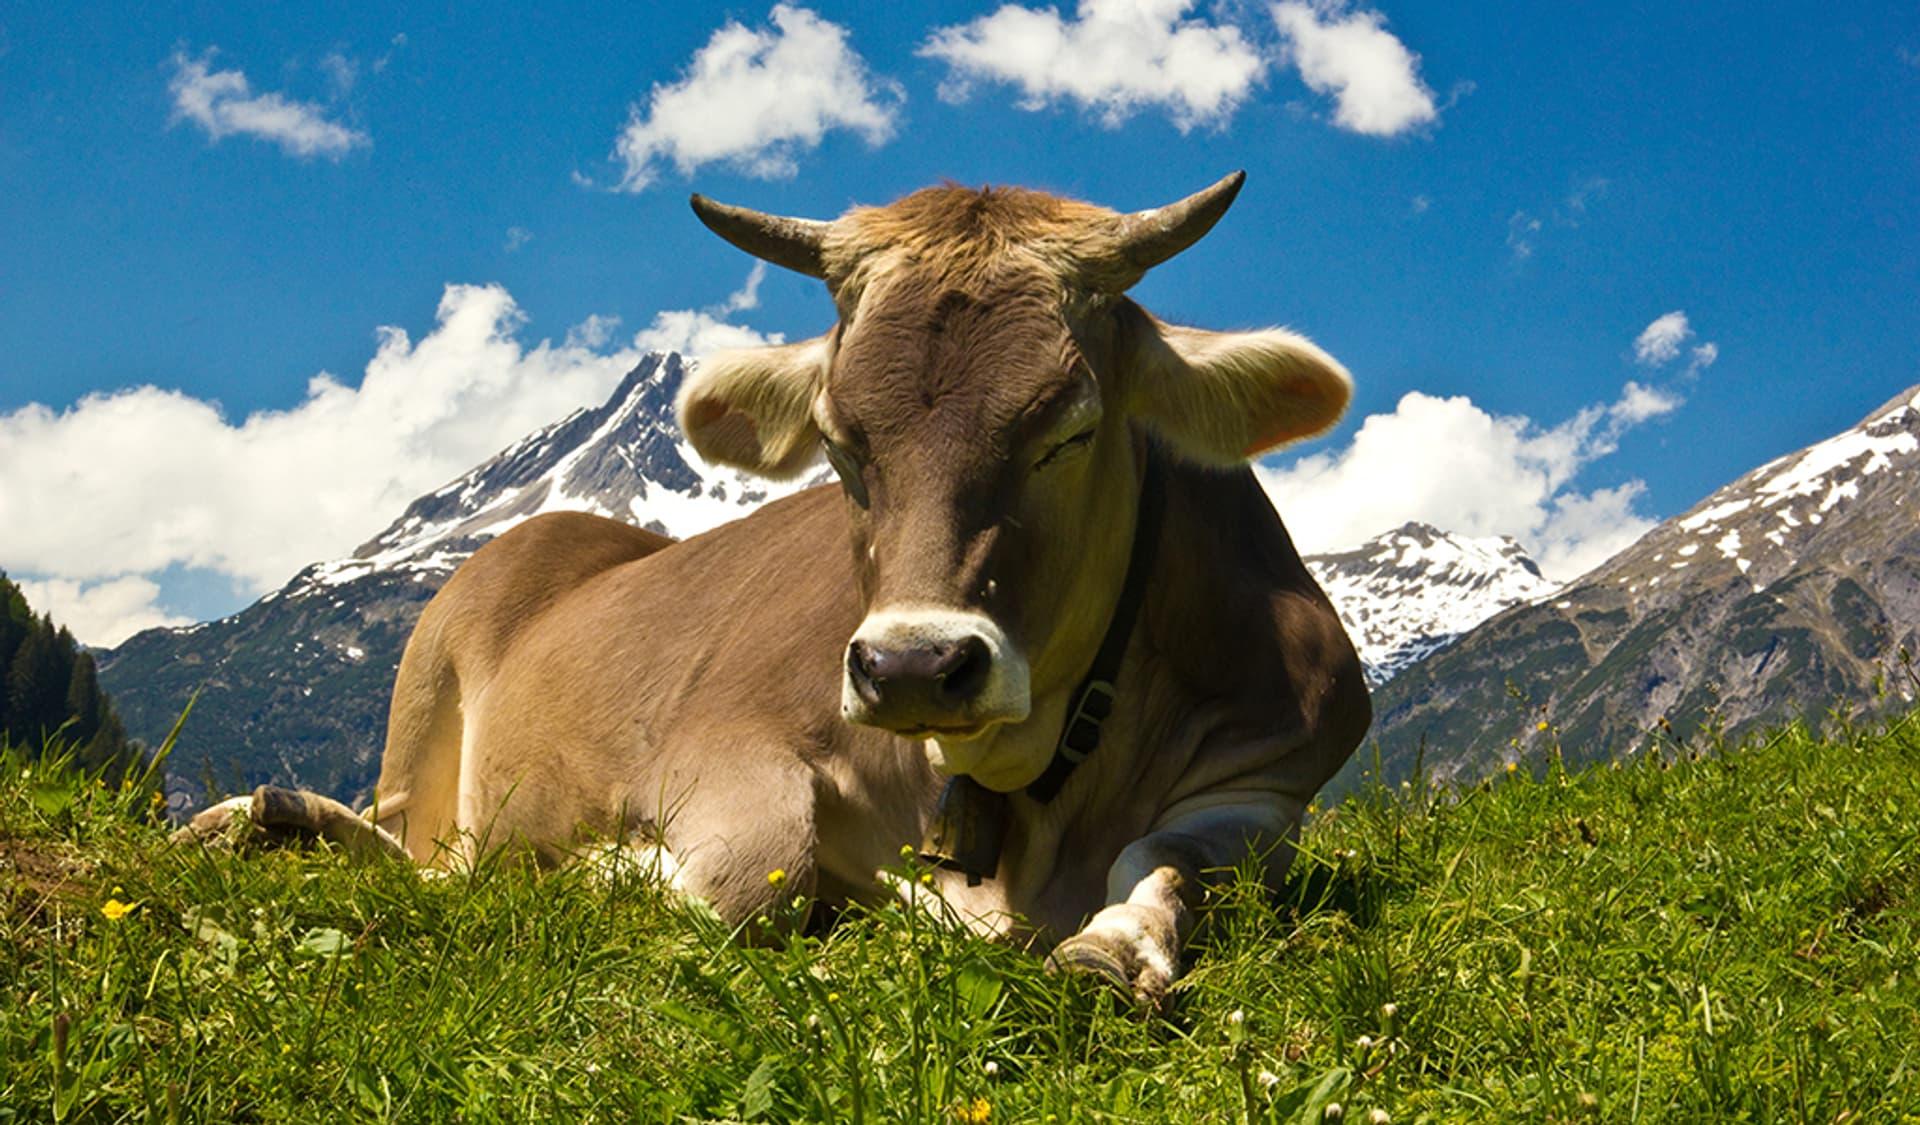 Kuh liegt im Gras mit Berglandschaft